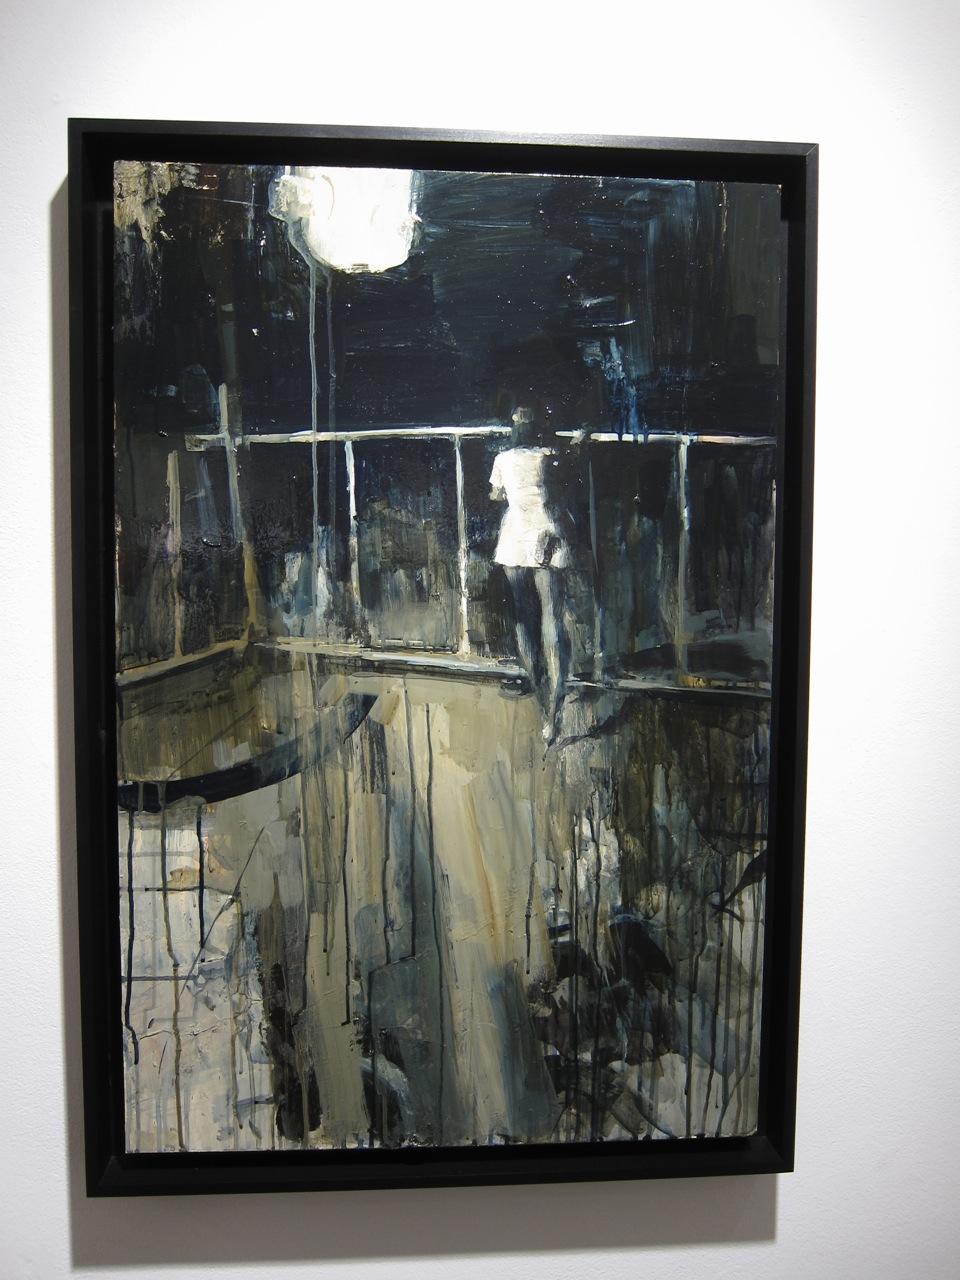 Ashley Wood Machine Levine AM 29